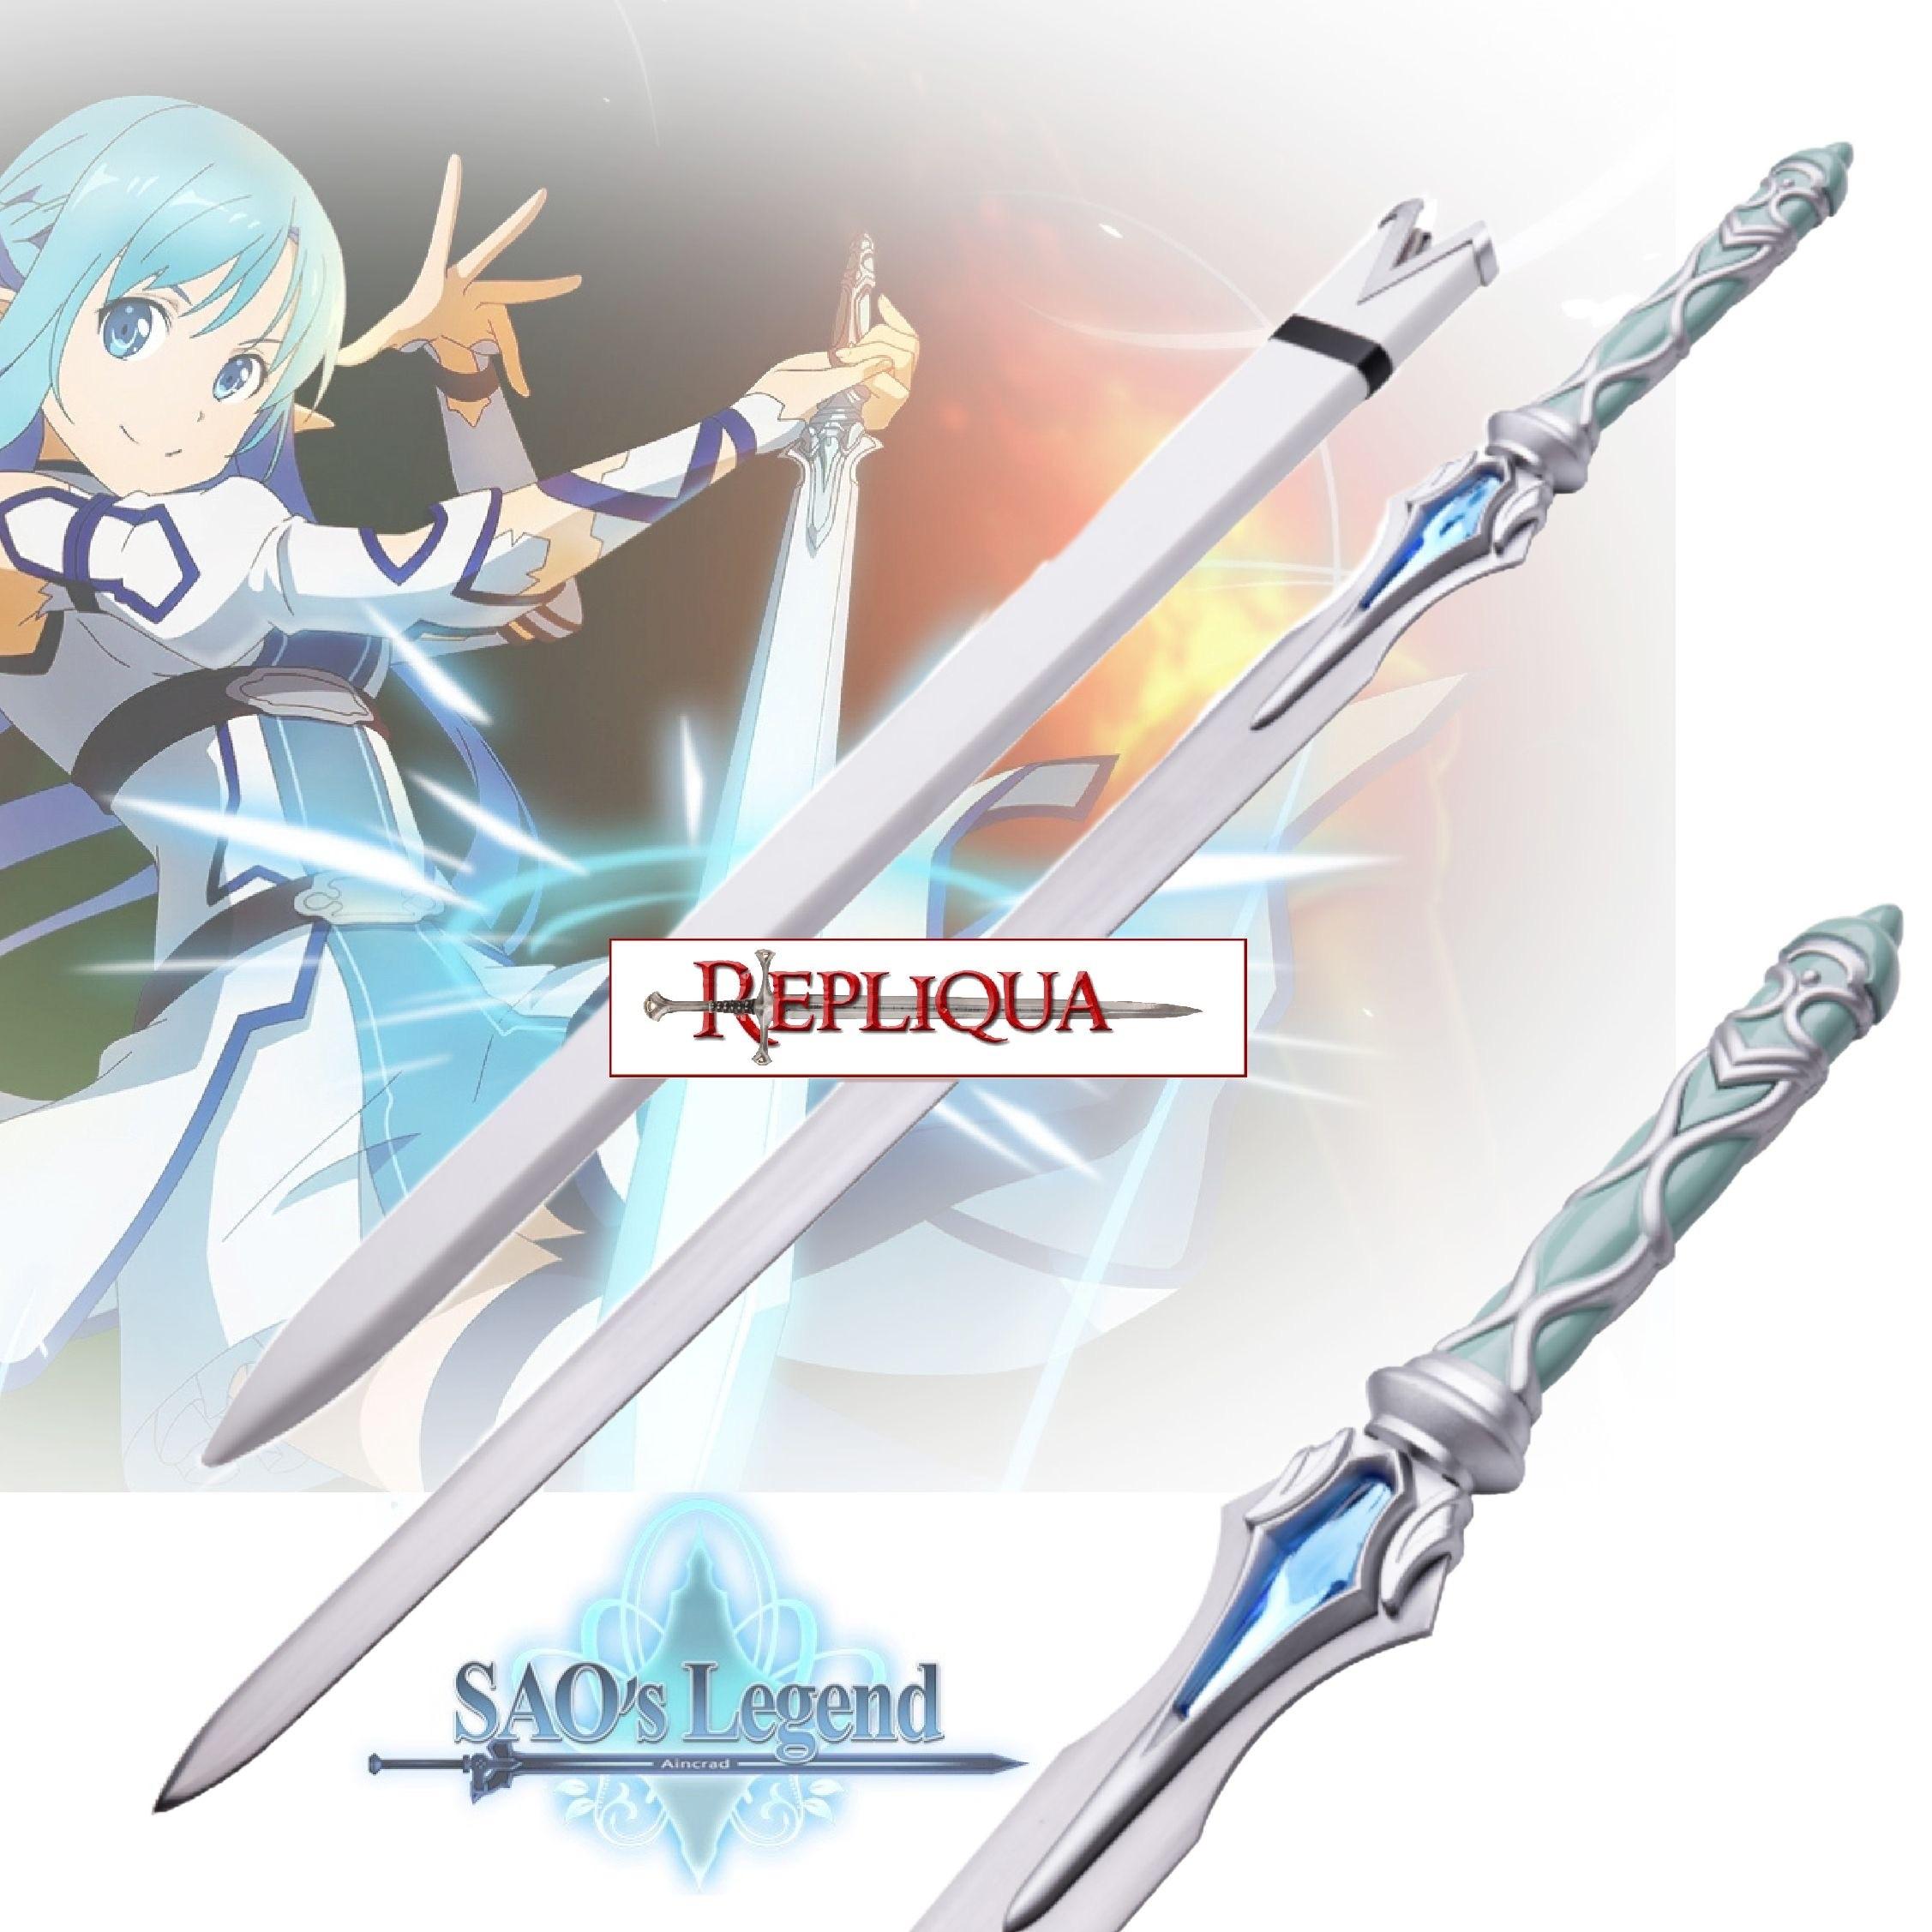 Épée New Asuna avec Ornement - Sword Art Online